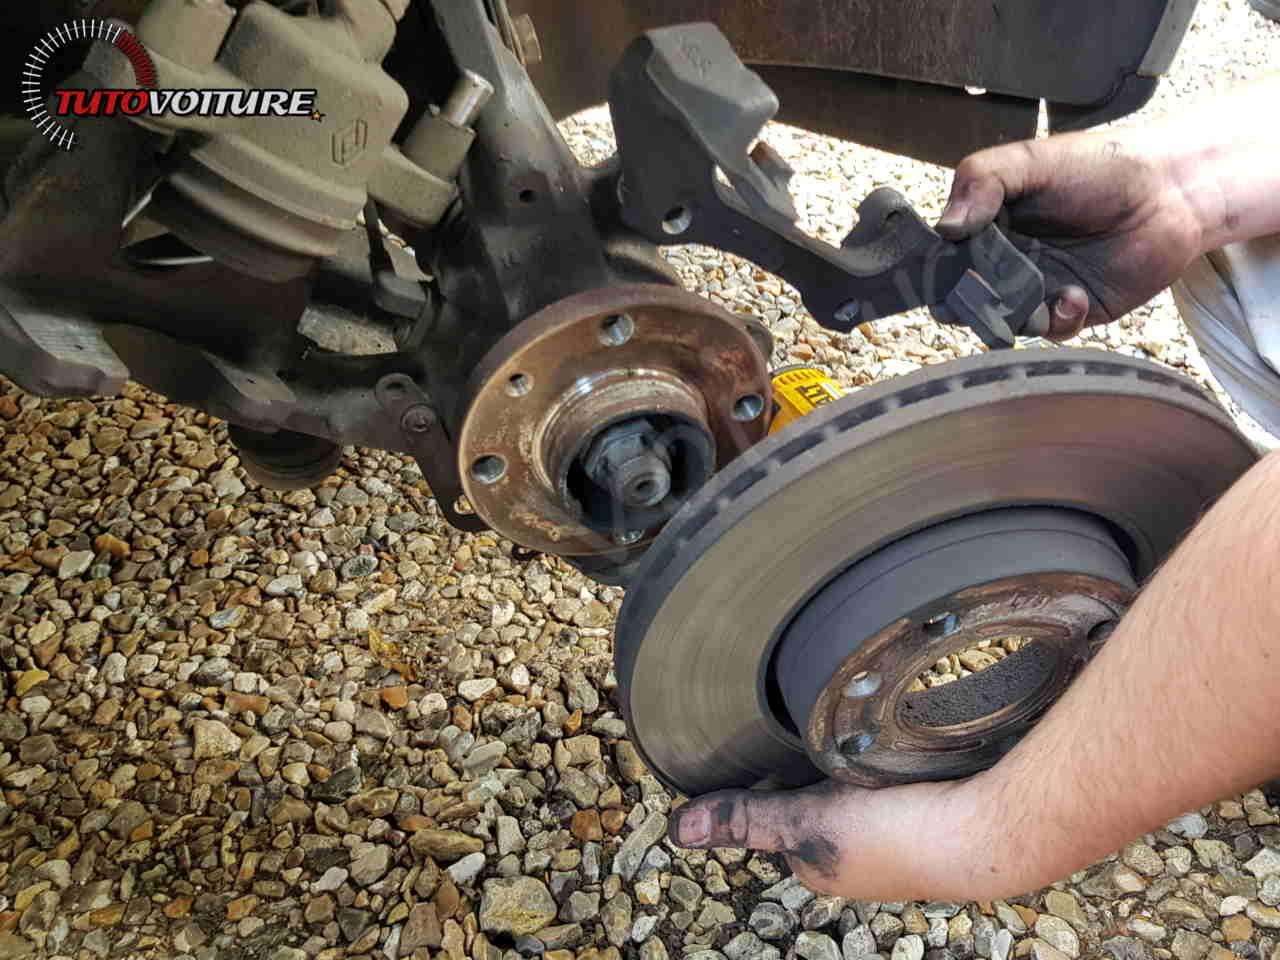 Retirer le disque de frein Clio 4